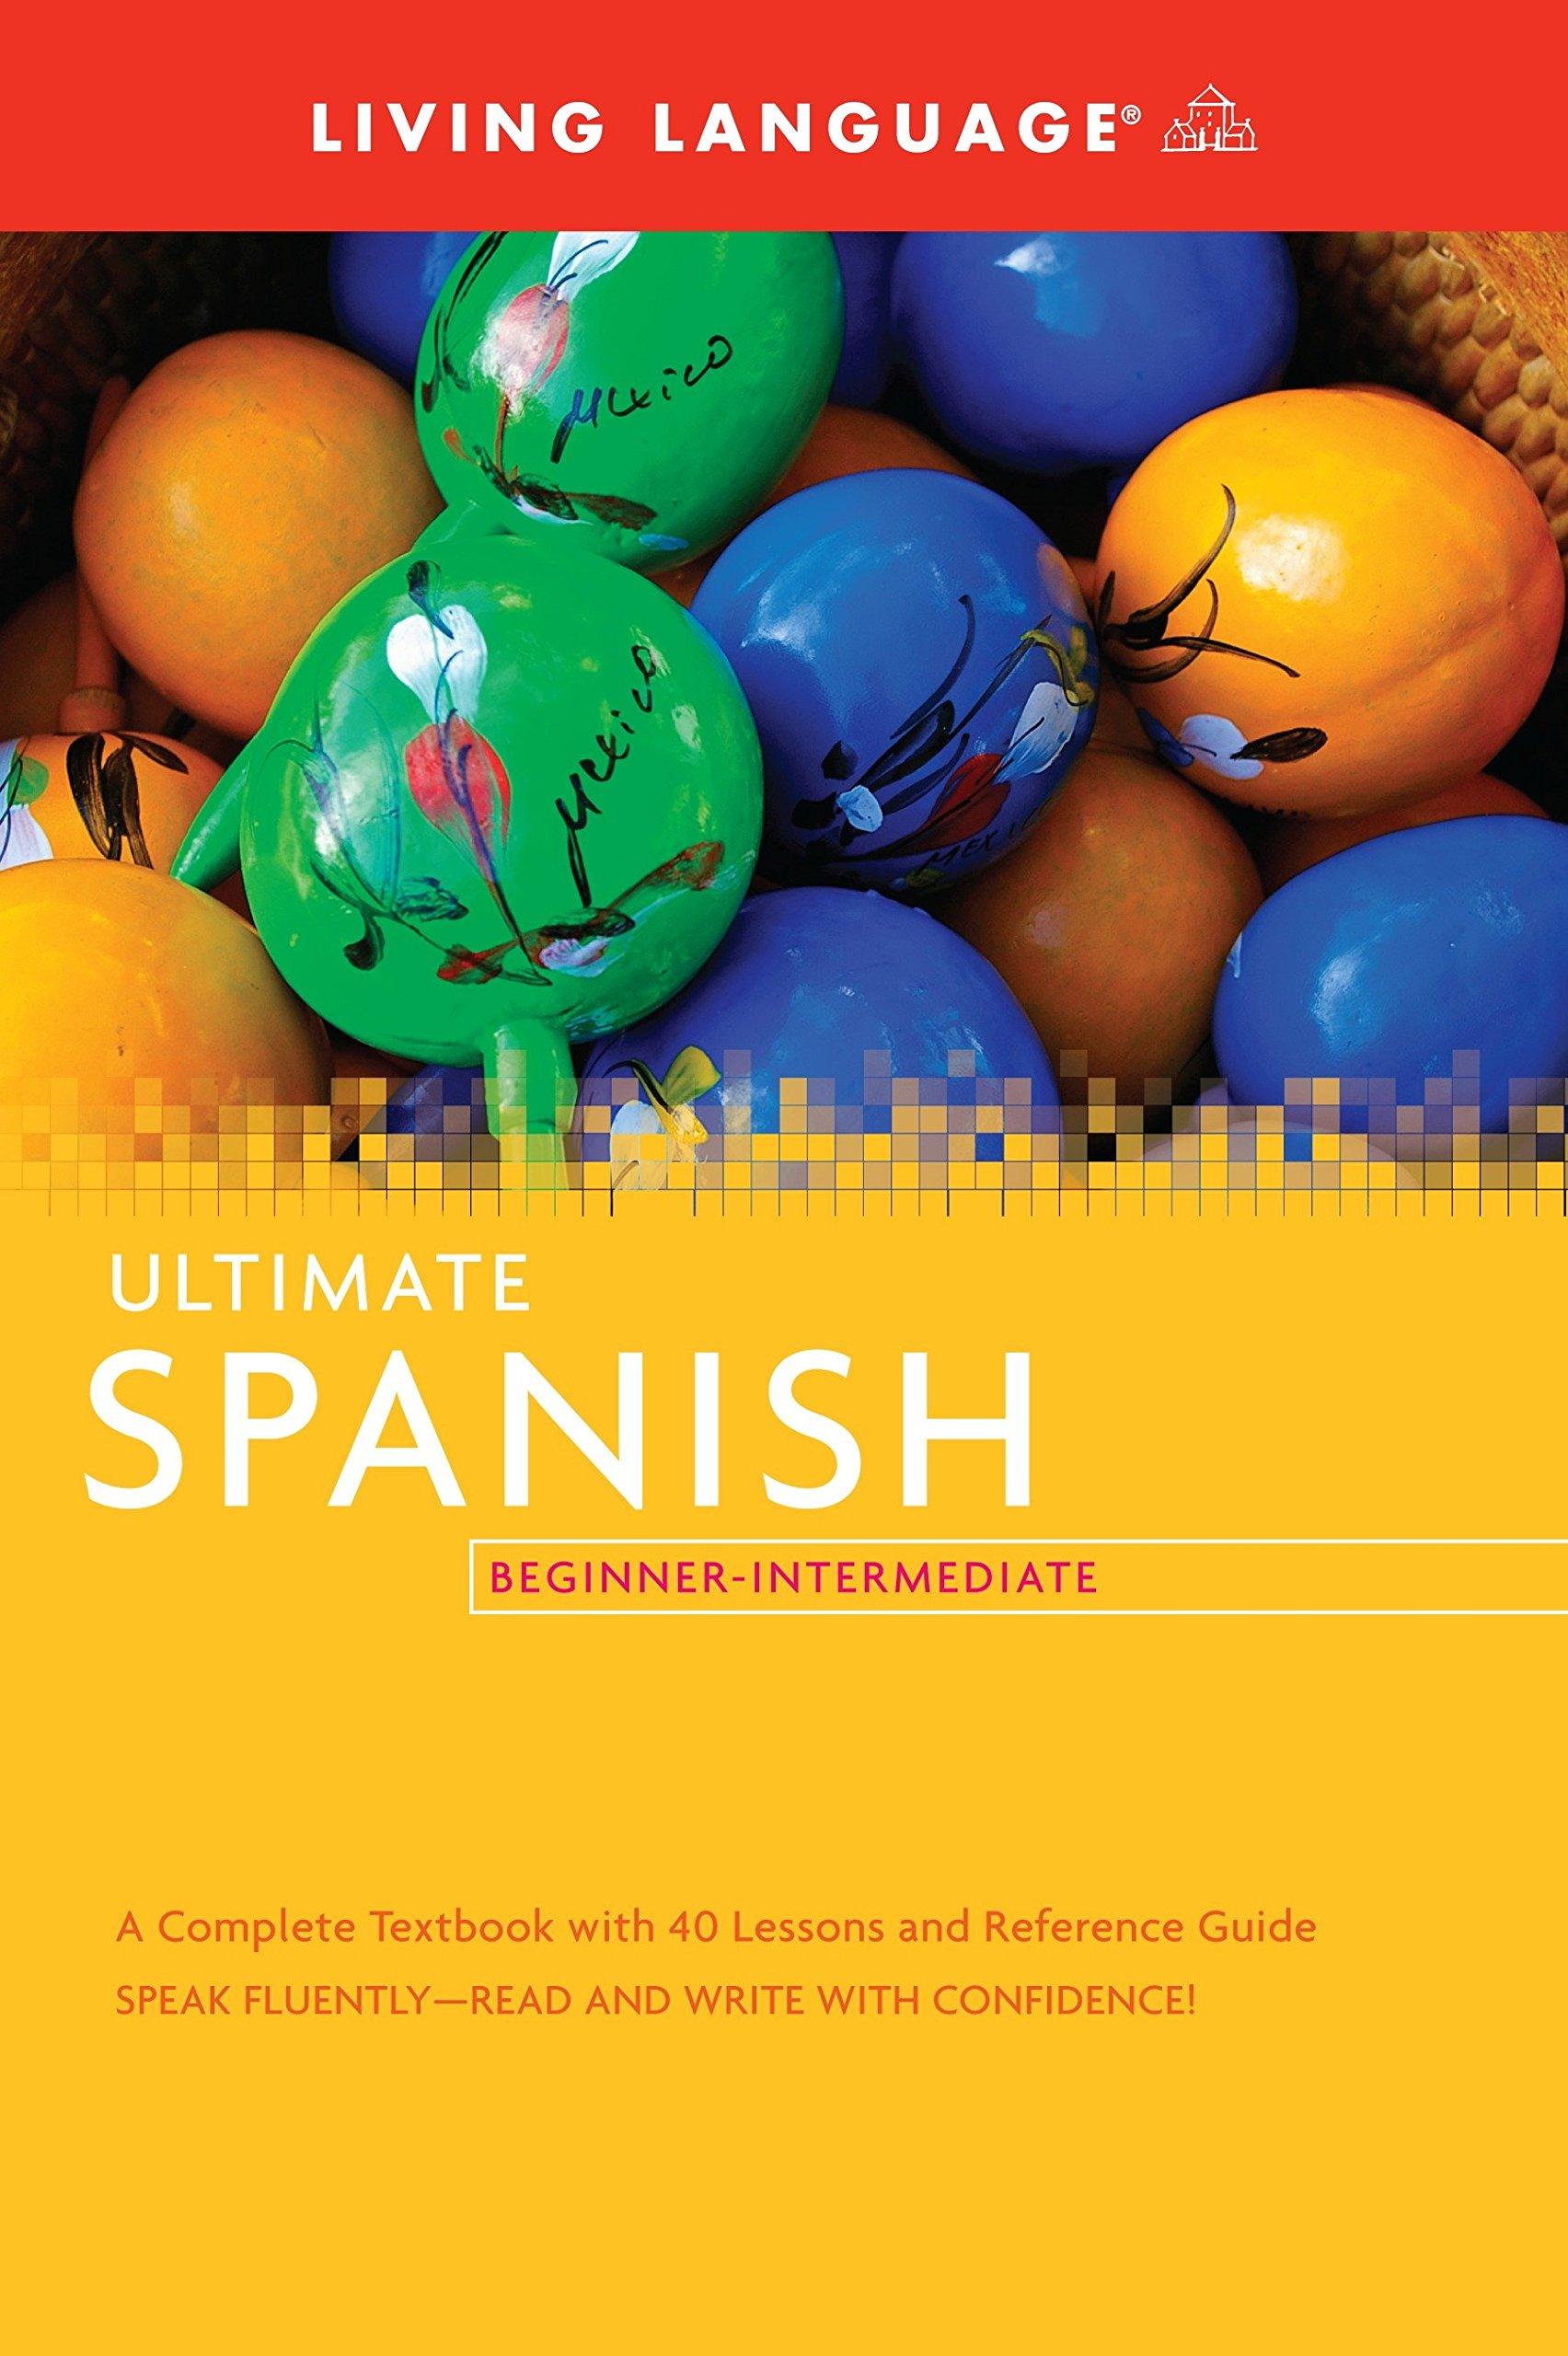 Ultimate Spanish Beginner-Intermediate (Coursebook) (Ultimate Beginner-Intermediate) by Living Language